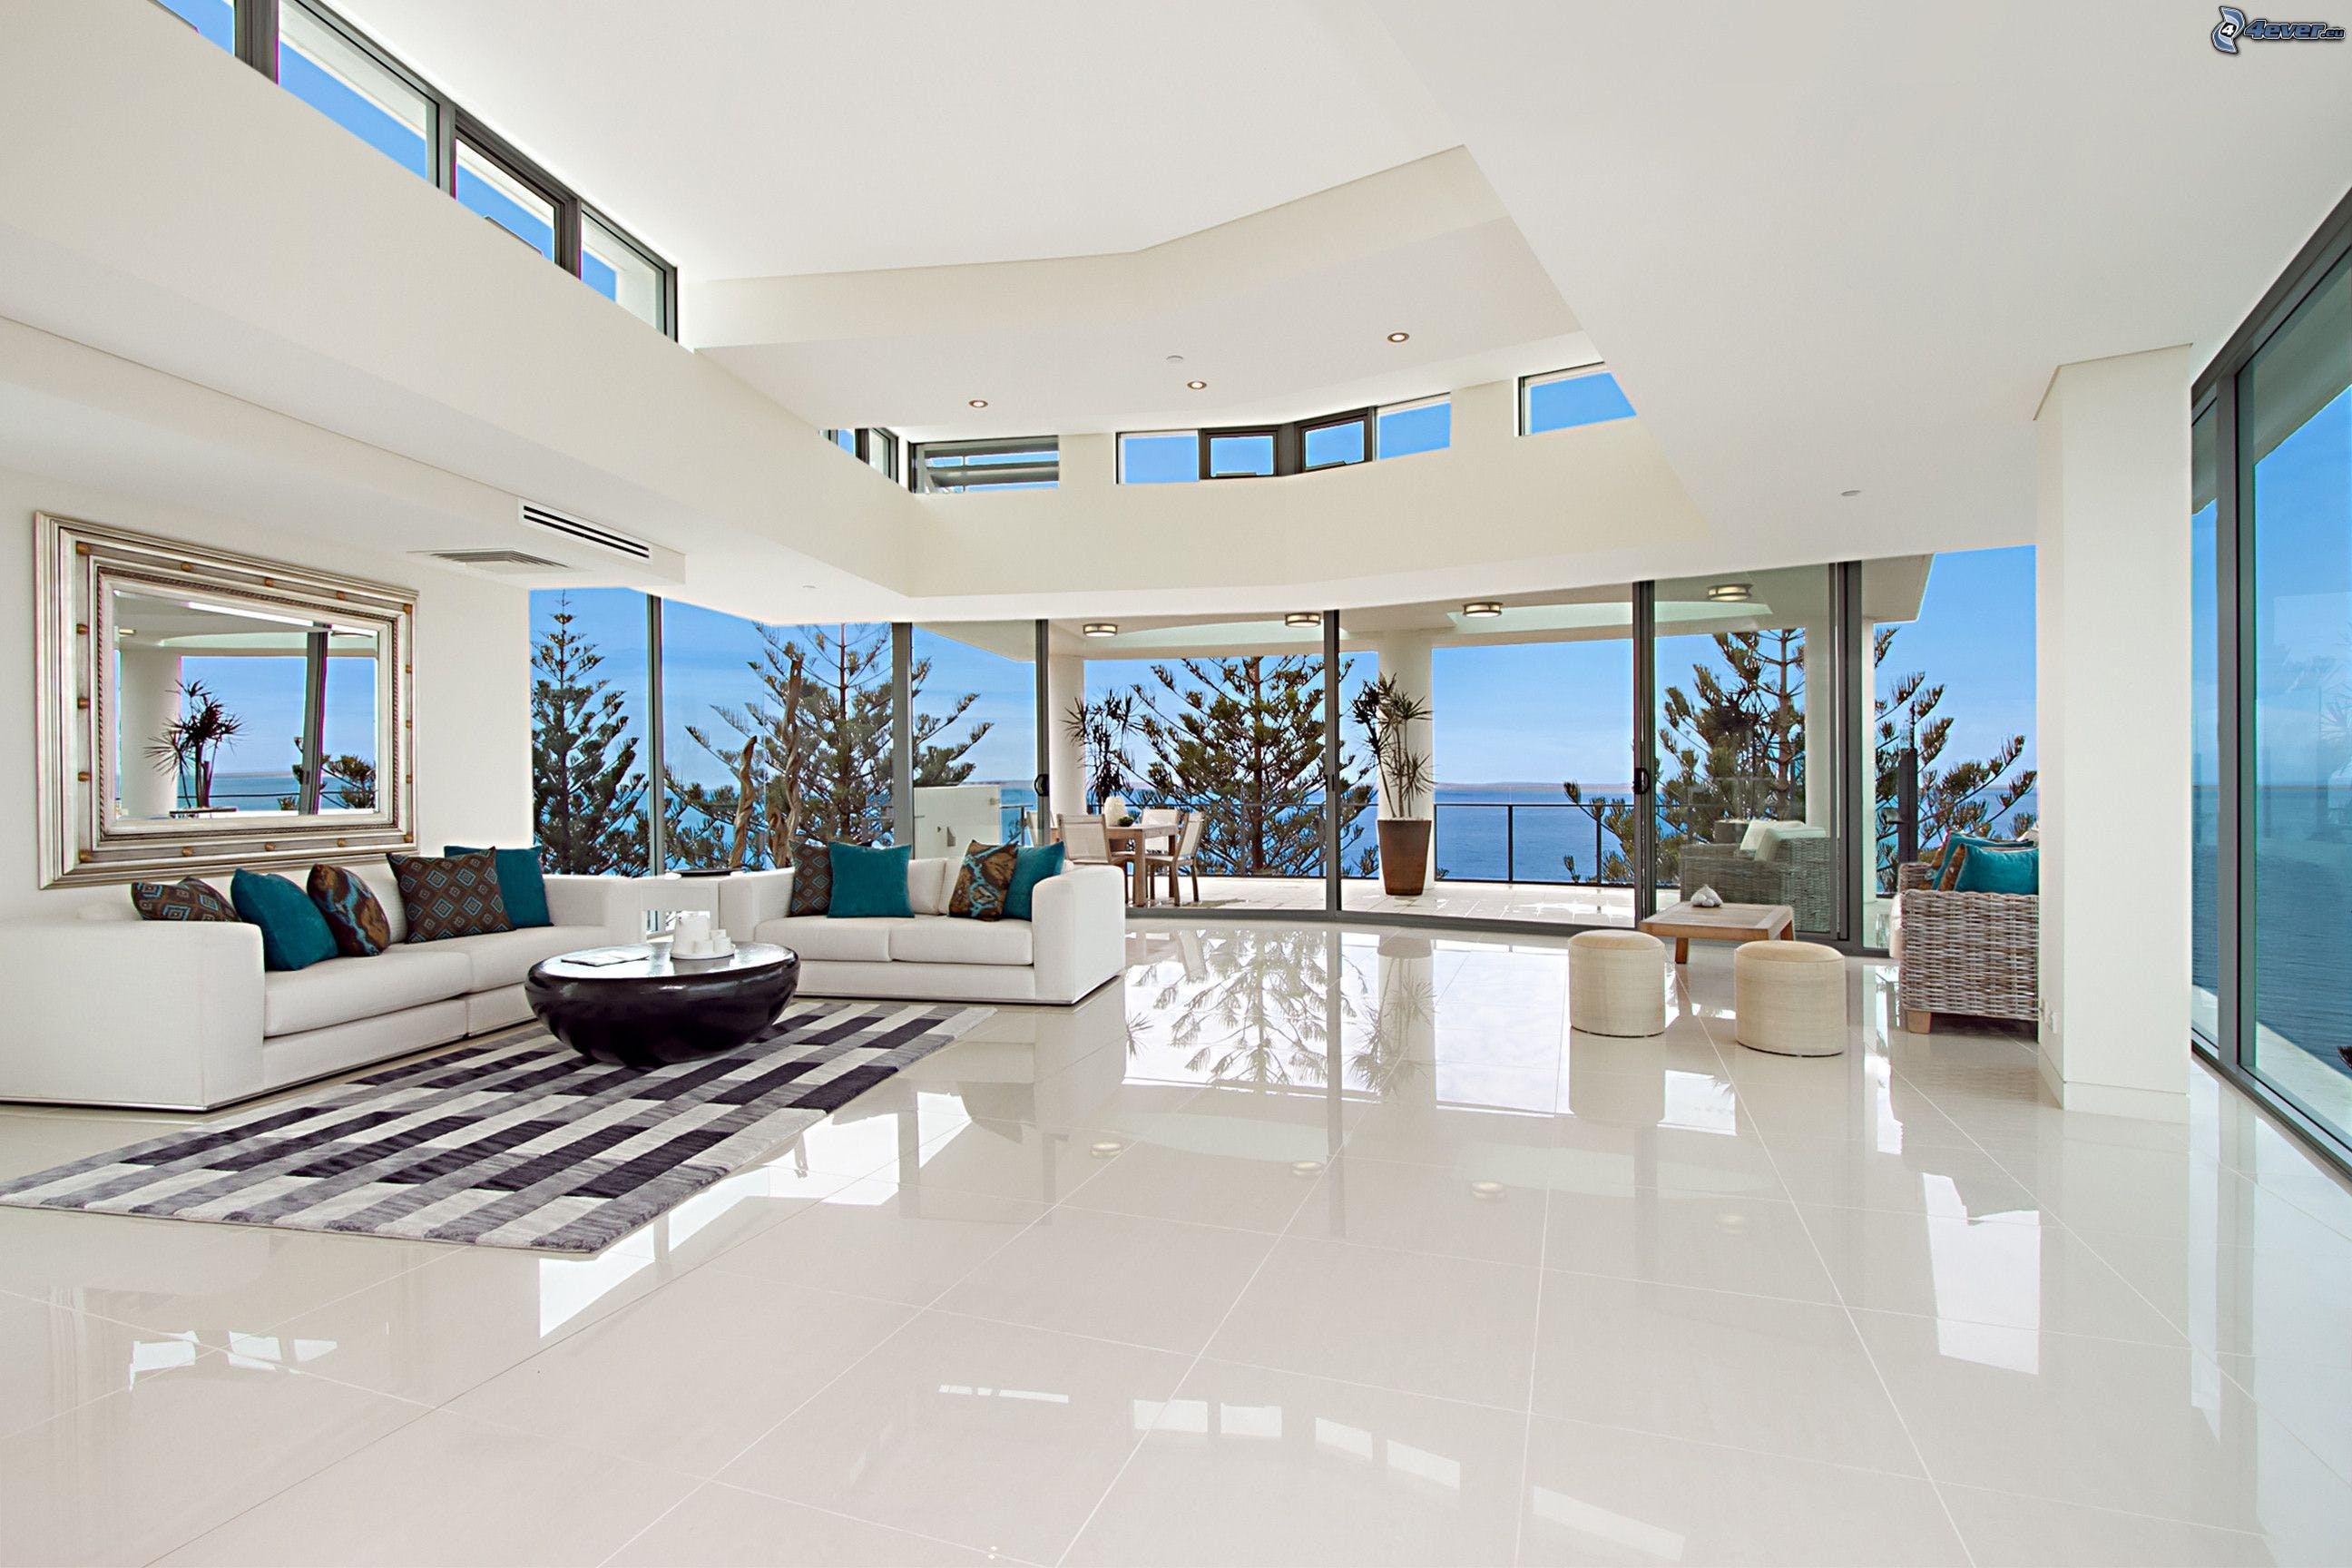 Free stock photo of living room